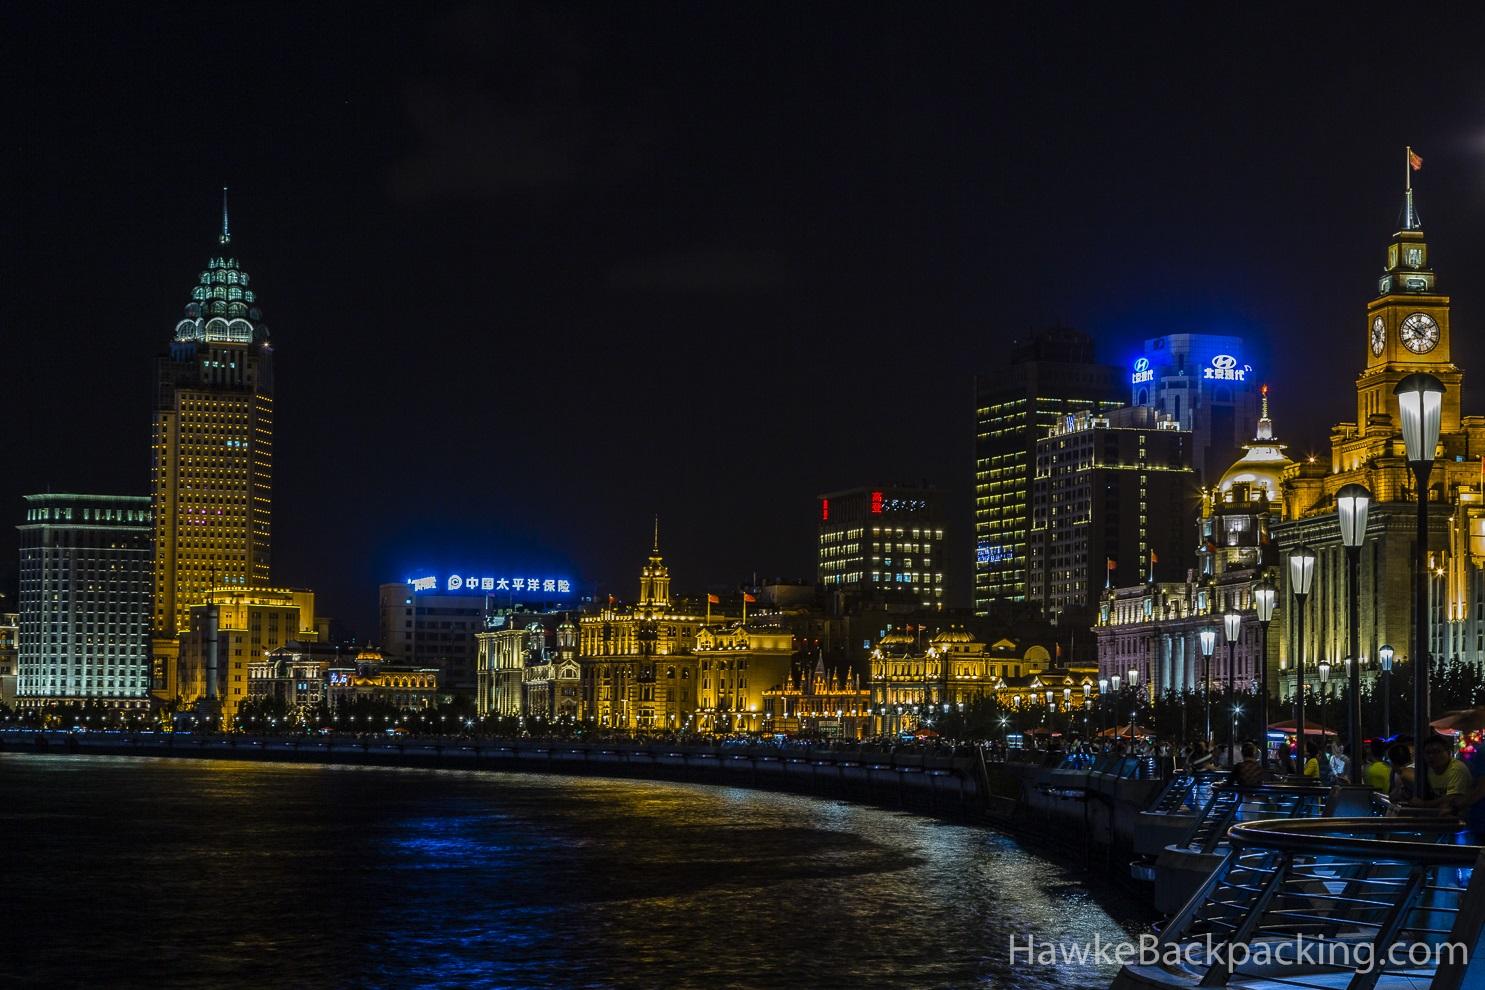 Shanghai At Night Hawkebackpacking Com